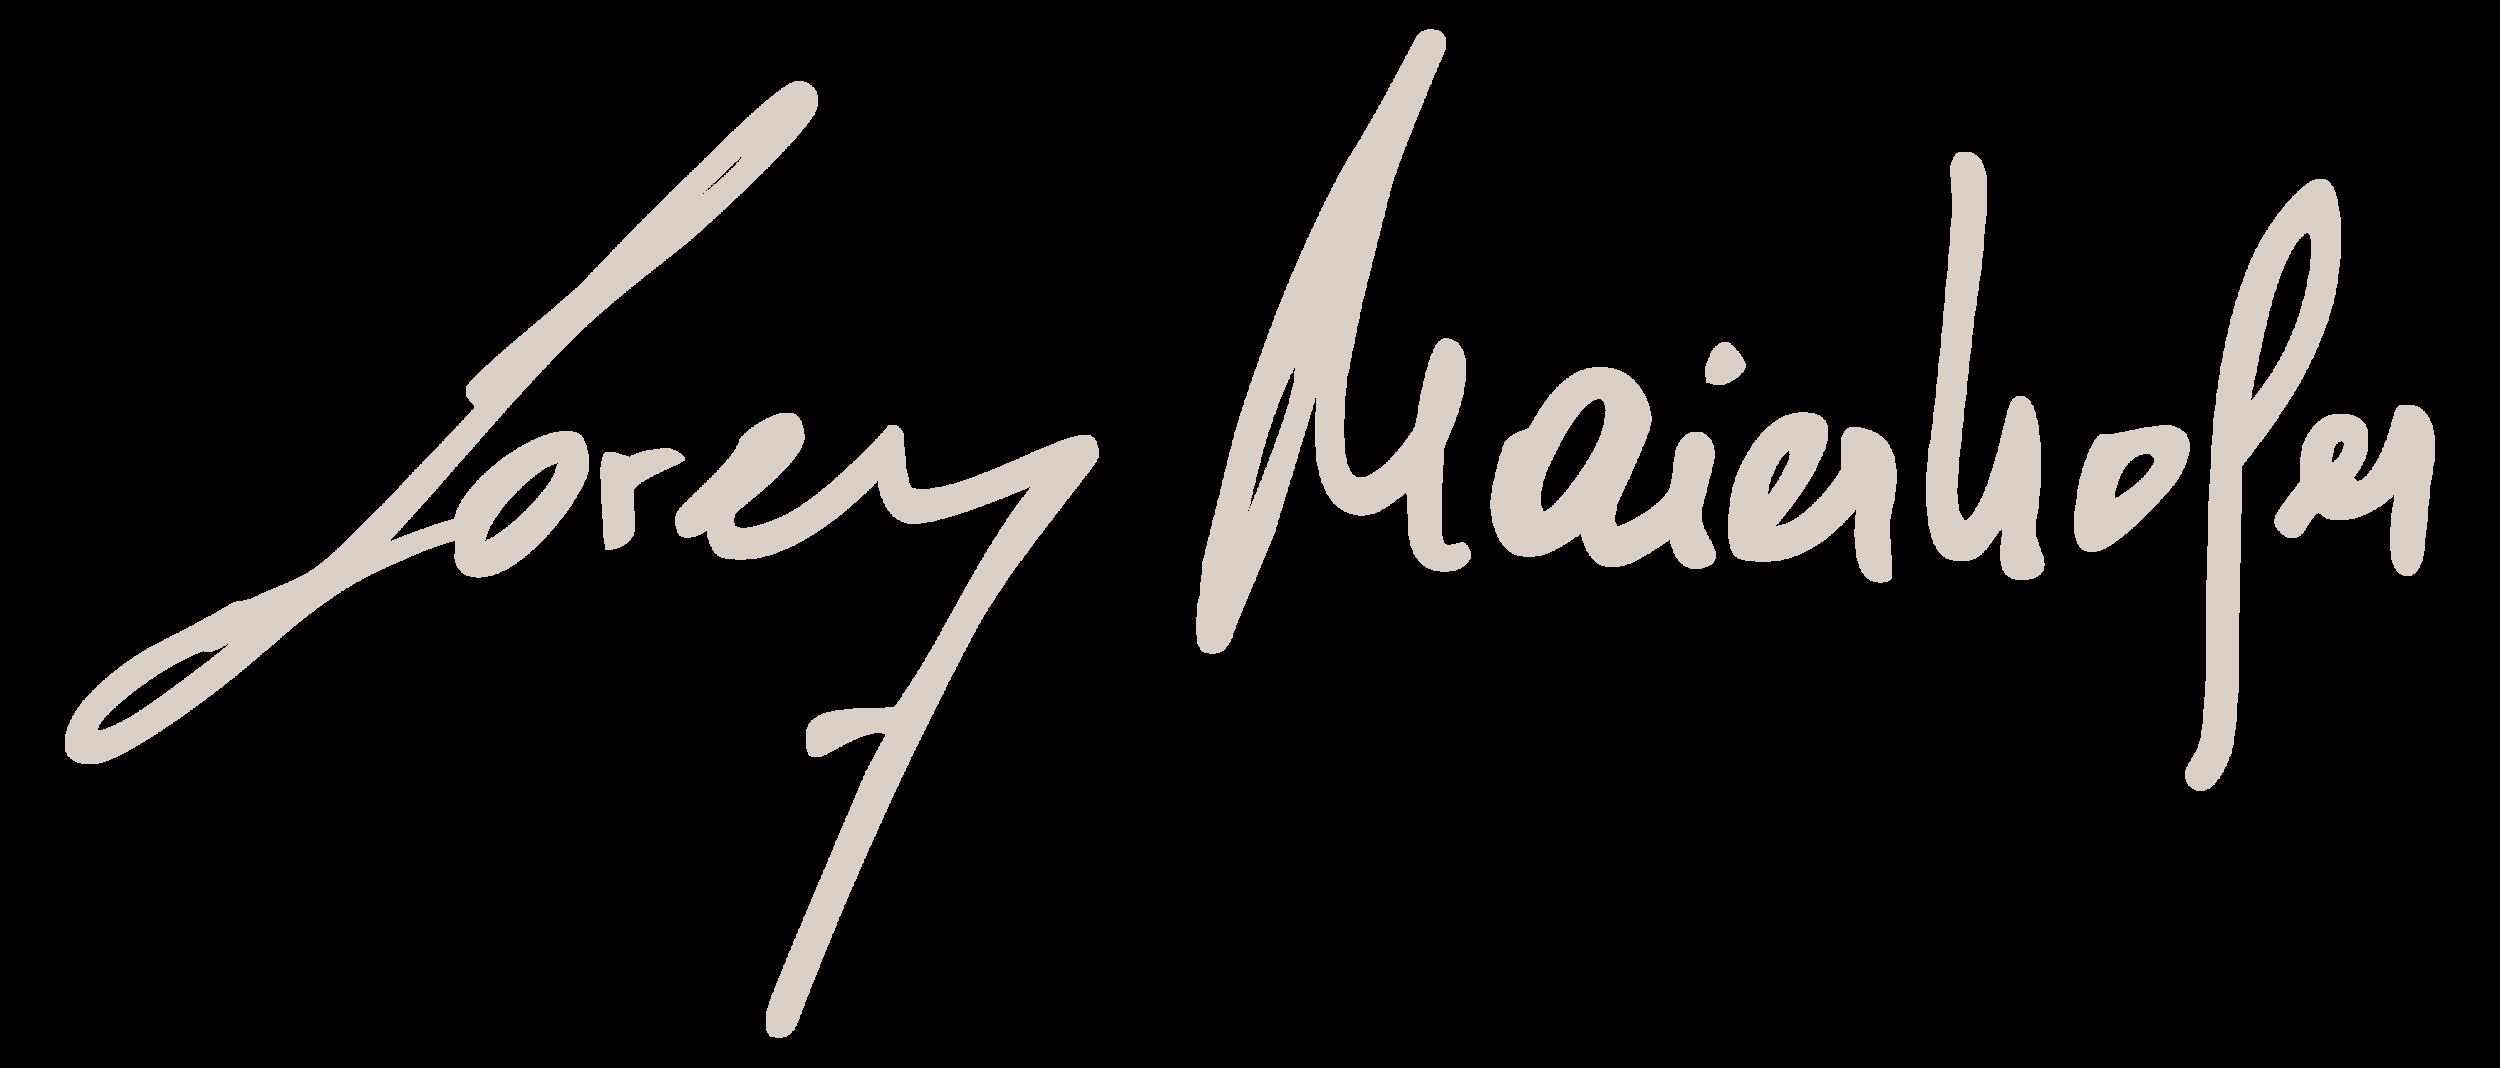 Composer – Lorenz Maierhofer | Official Page